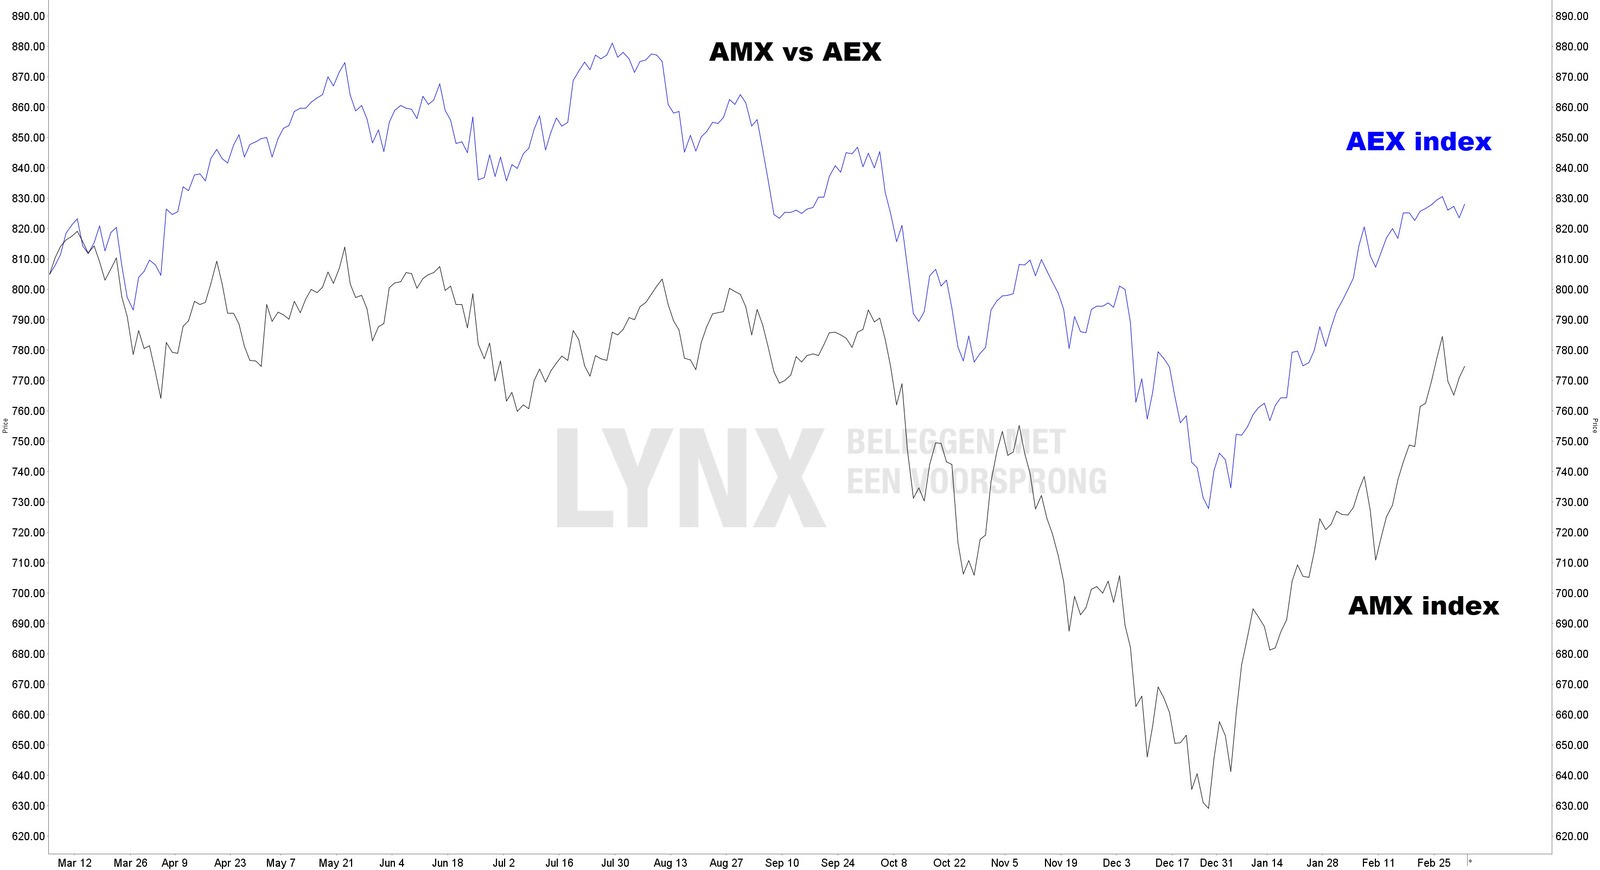 koers AMX index vs AEX index